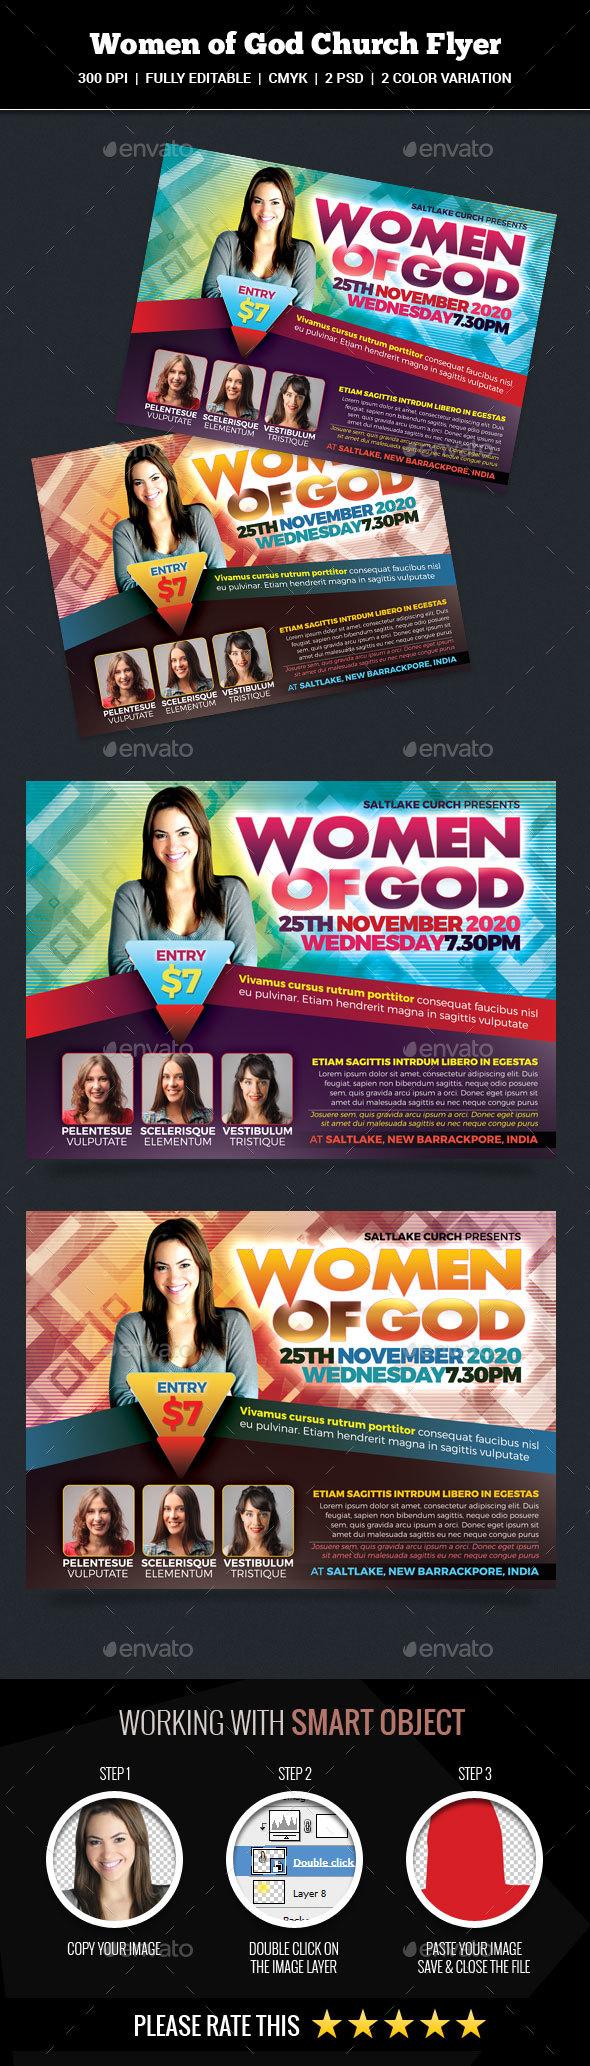 Women of God Church Flyer - Church Flyers